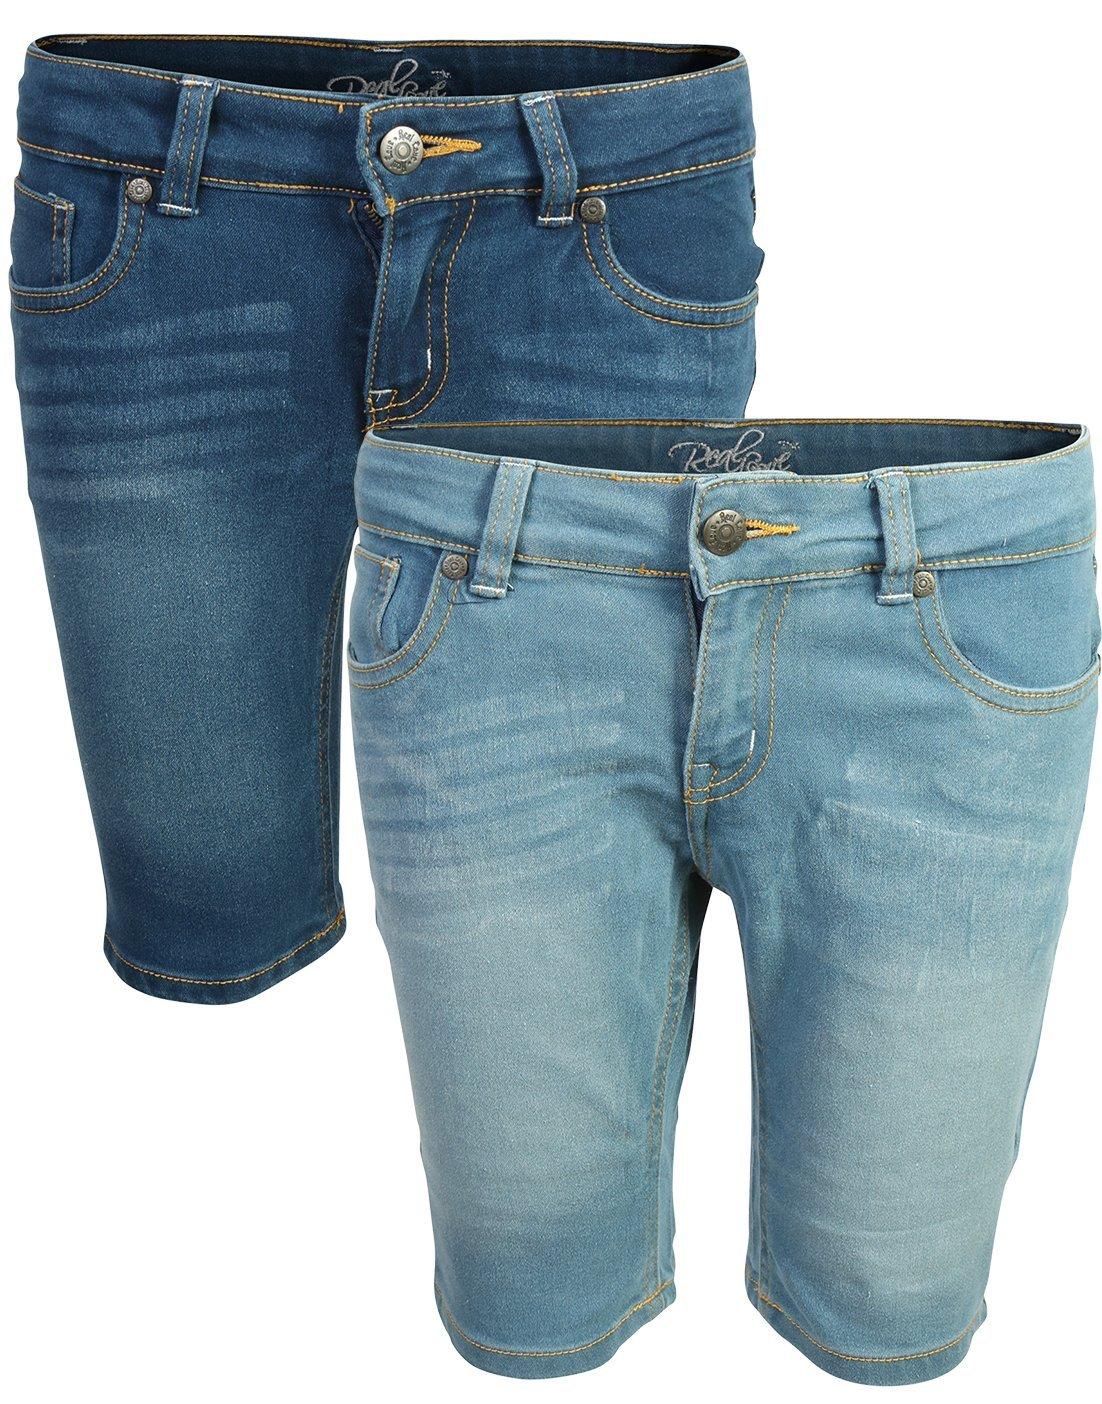 Real Love Girl's Bermuda Denim Shorts (2 Pack) Dark & Light, Size 7'